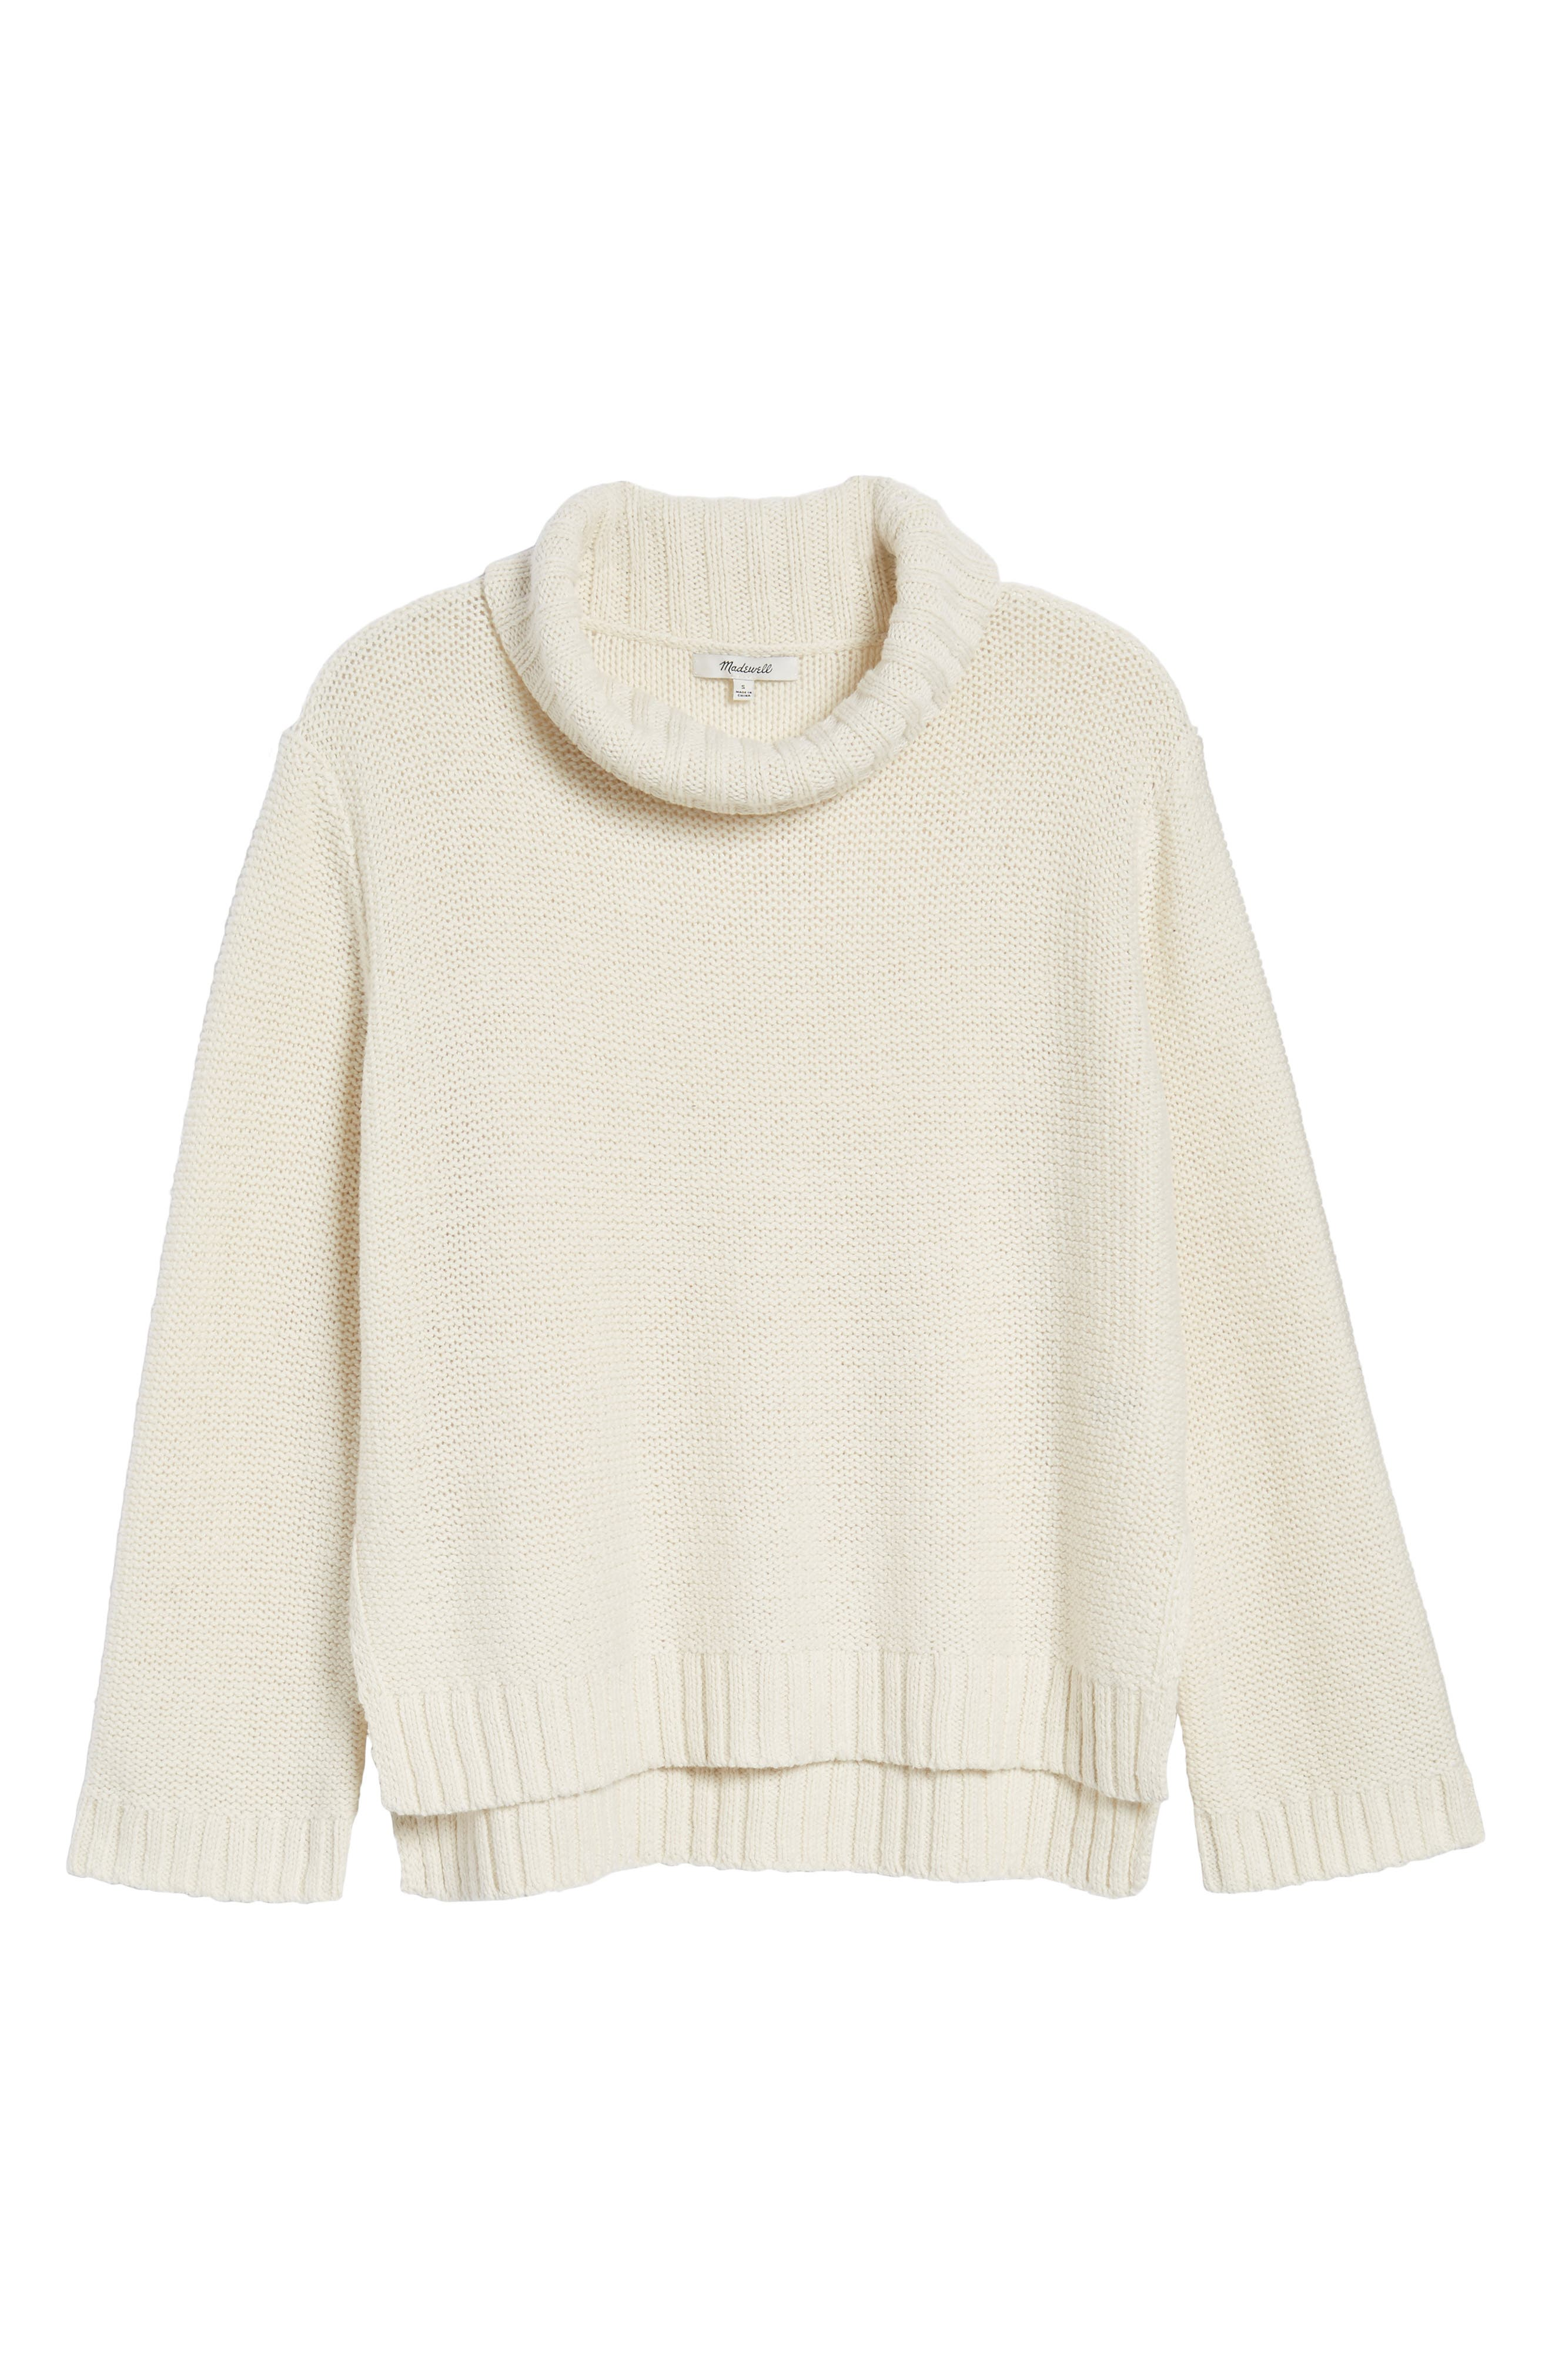 Madewell Flecked Turtleneck Sweater